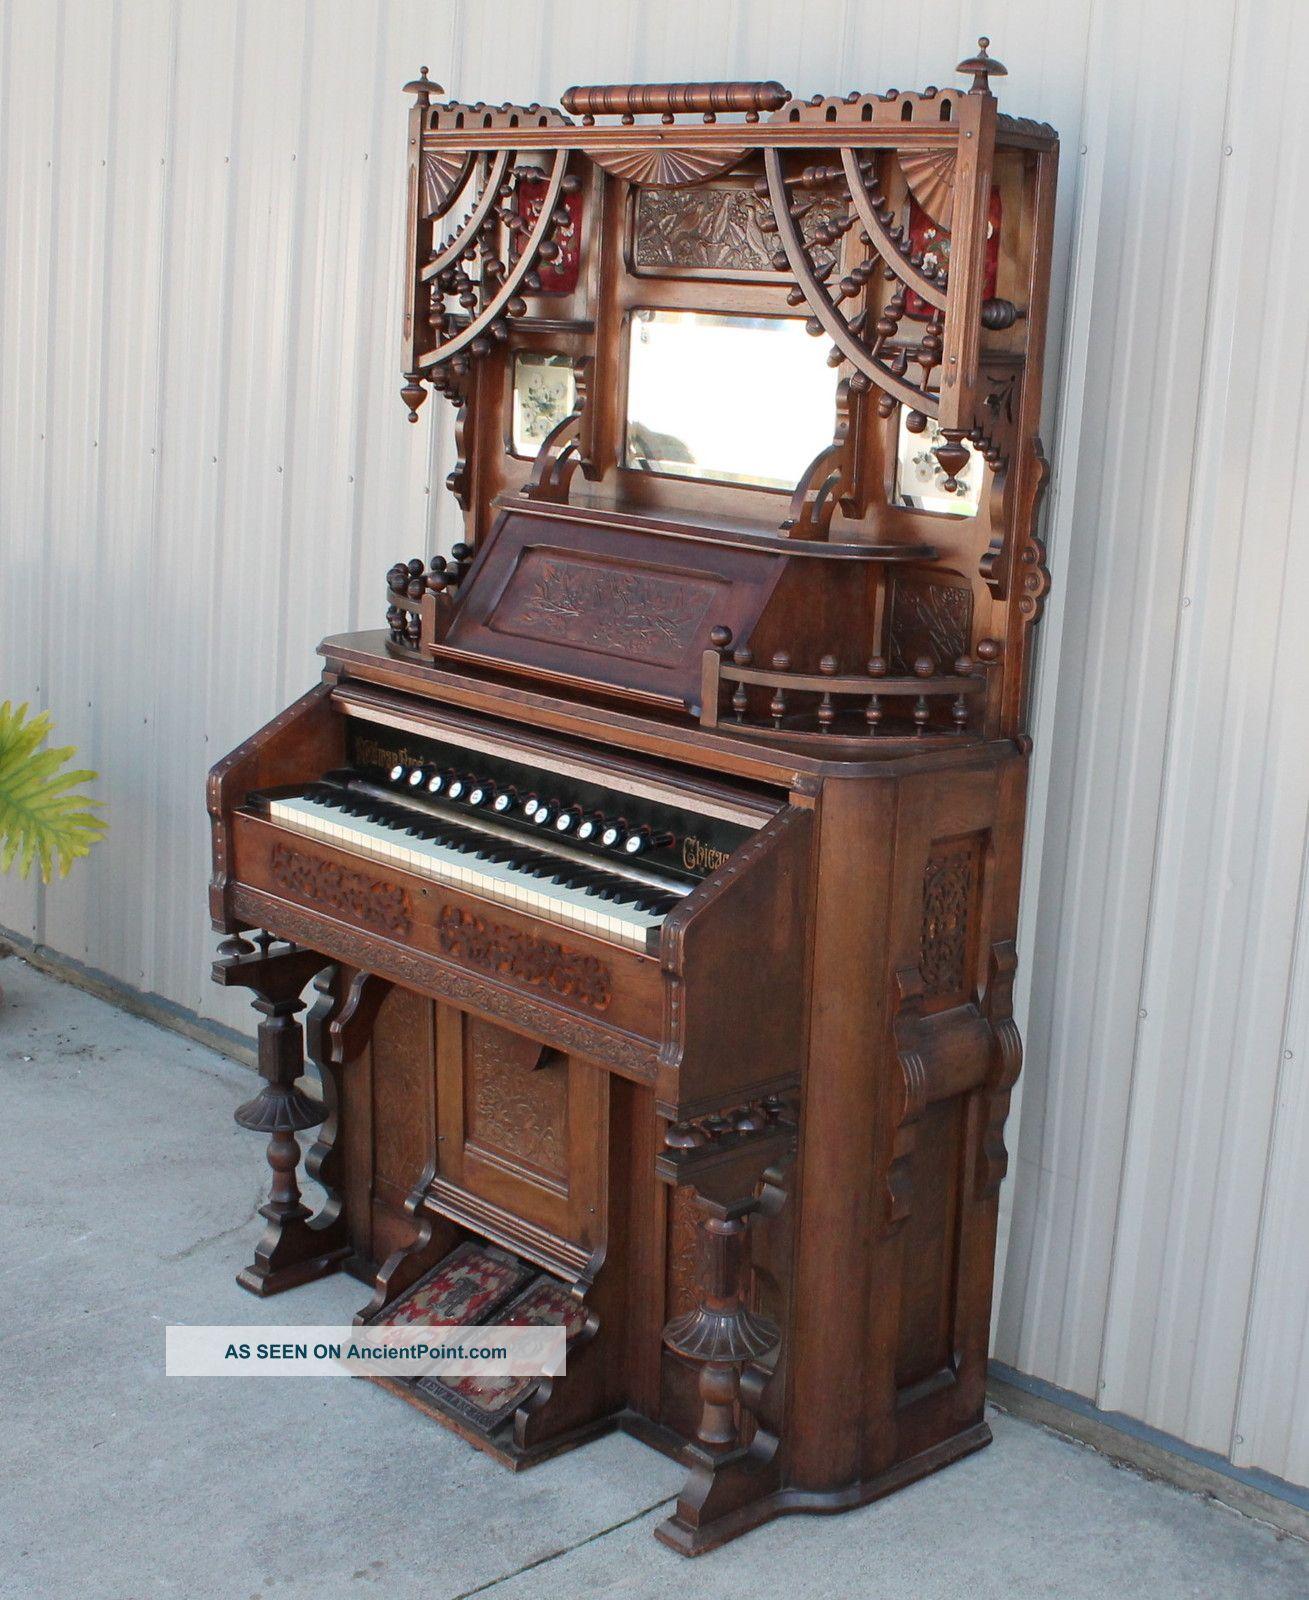 Fabulous Neman Brothers Stick & Ball Victorian Parlor Pump Organ Keyboard photo